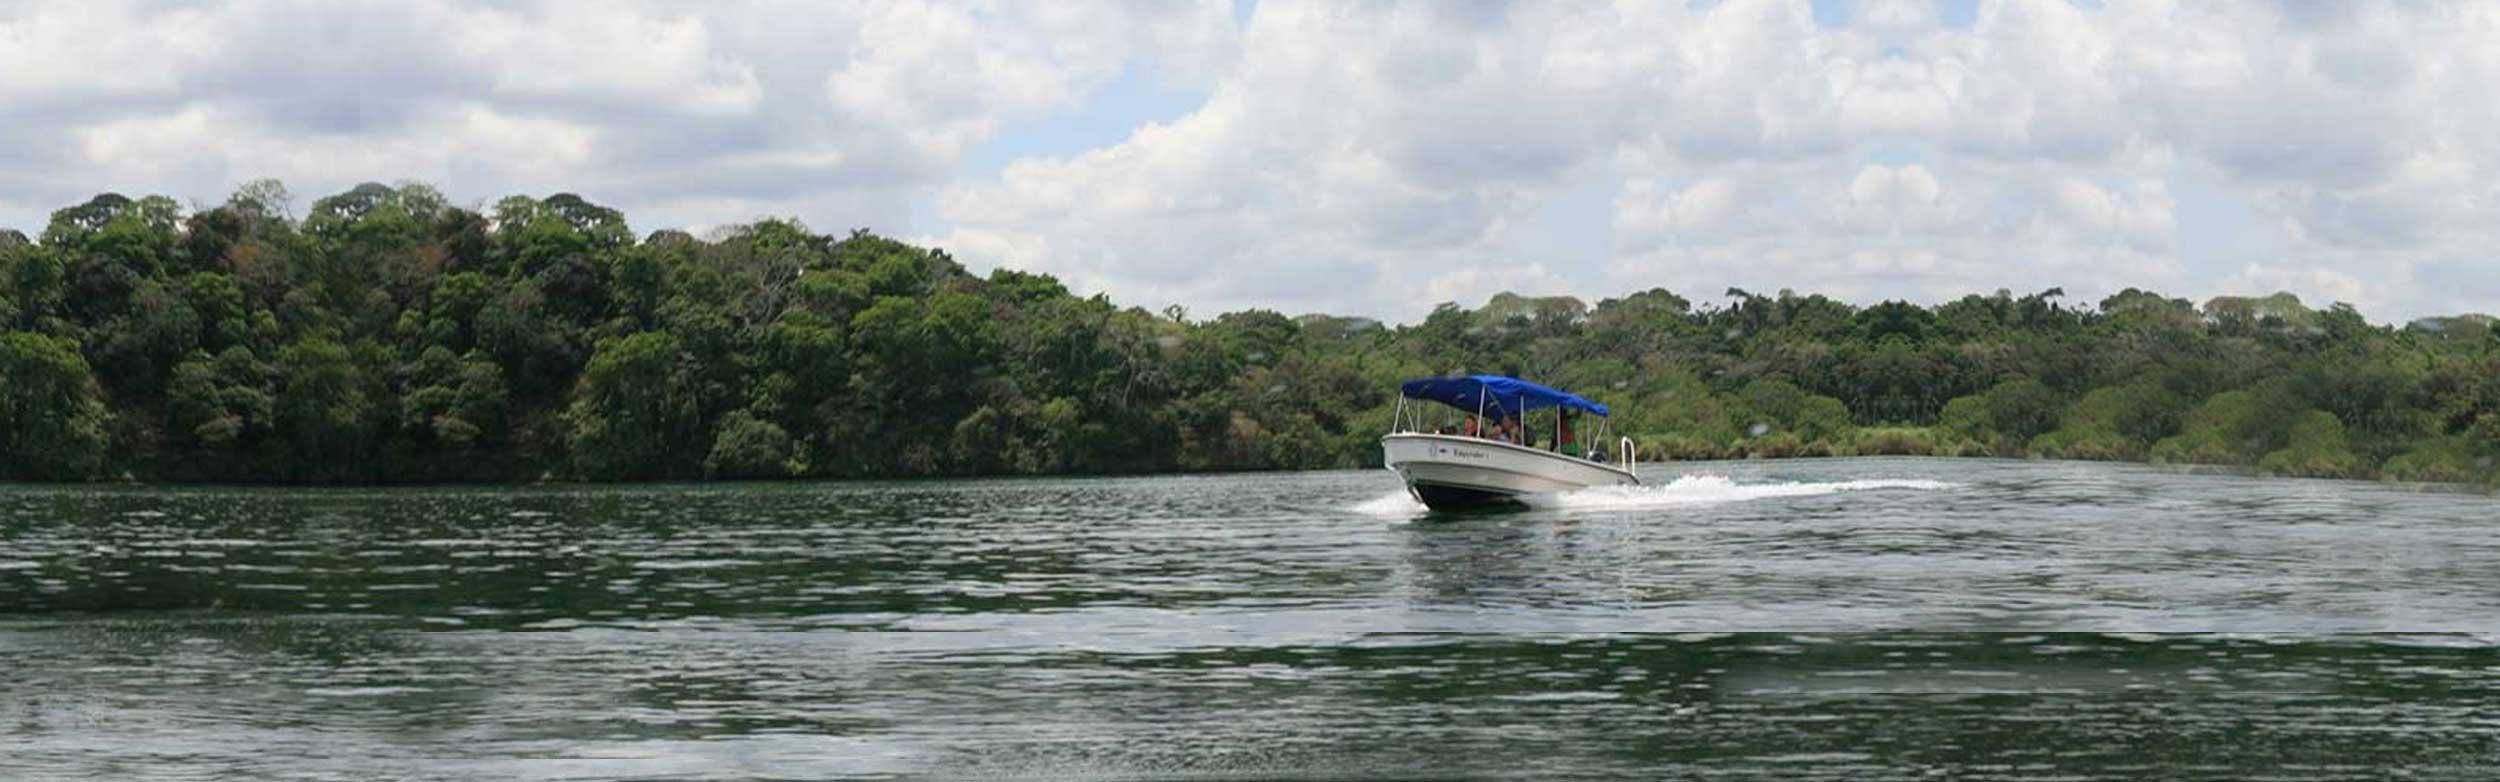 Gatun Lake Boat Tour